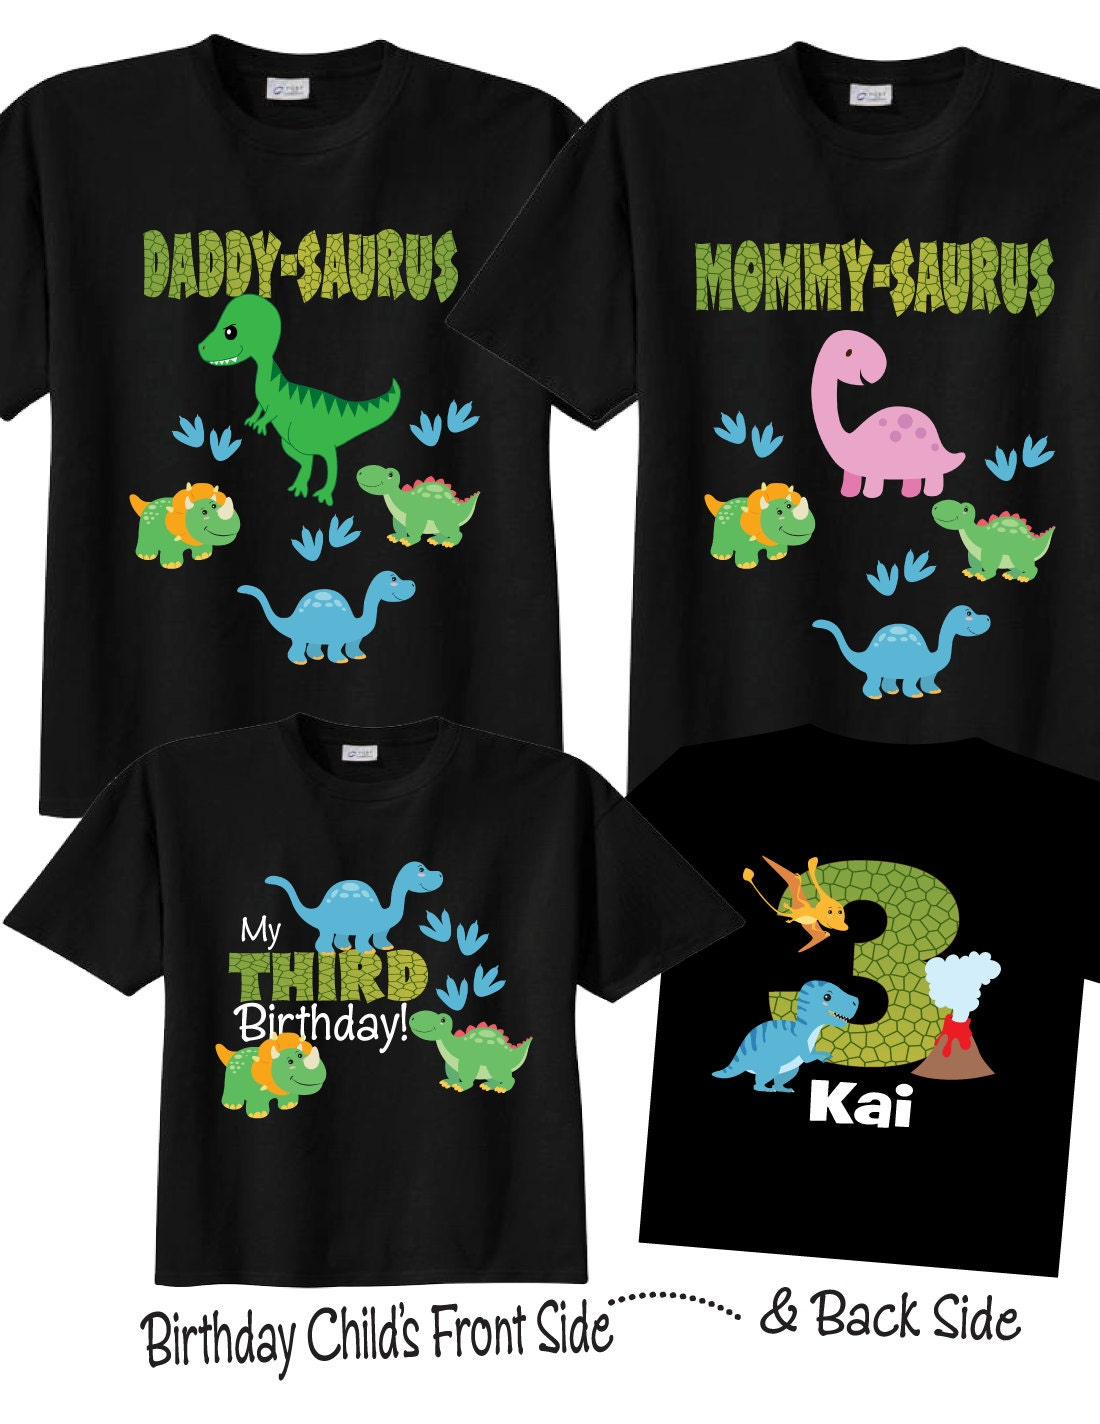 5b4ad82c 3 shirt set 3rd Birthday Shirts with Dinosaurs Family Birthday | Etsy